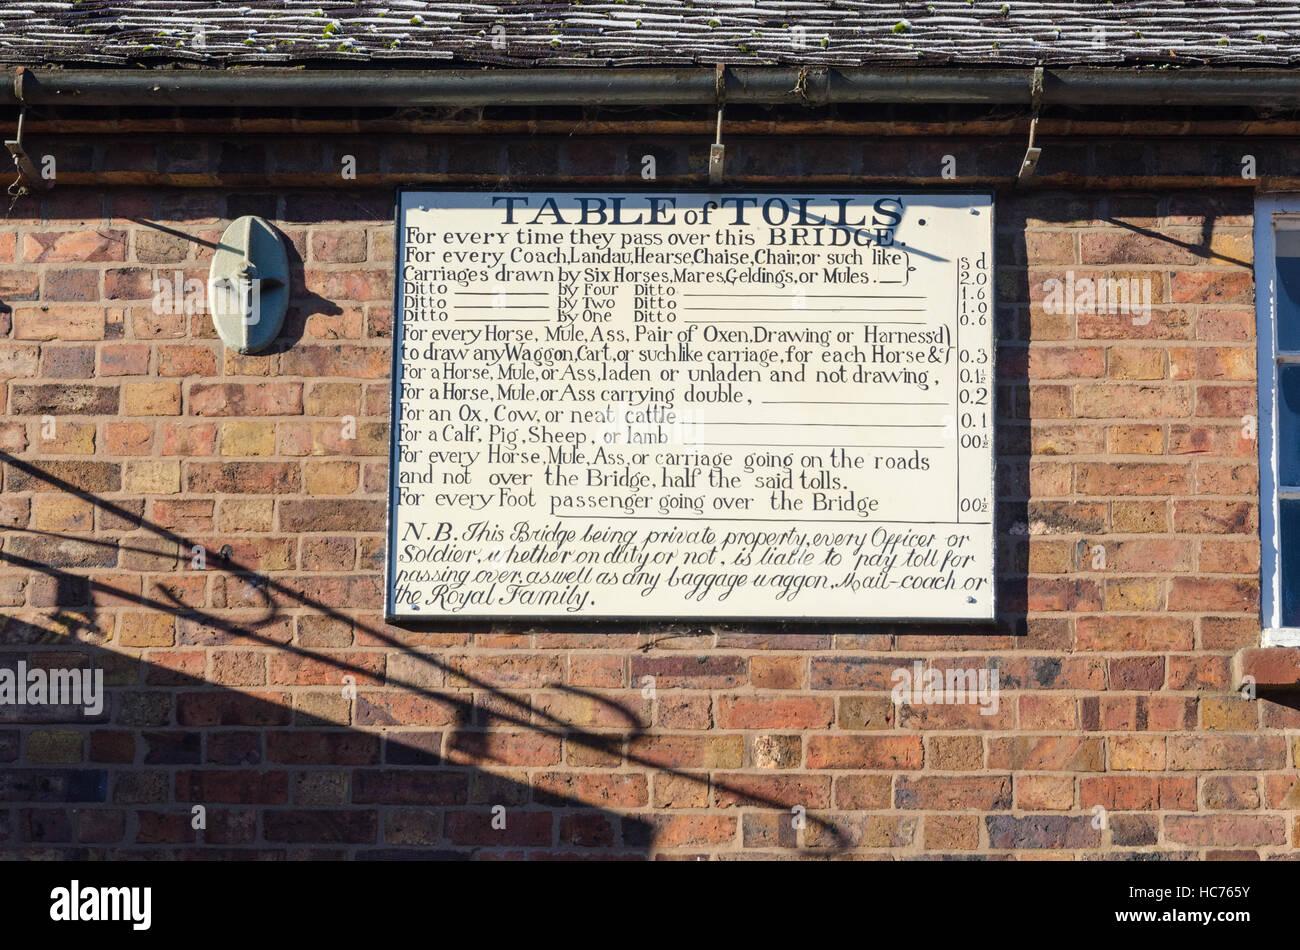 Iron Bridge Toll House in Ironbridge, Shropshire - Stock Image